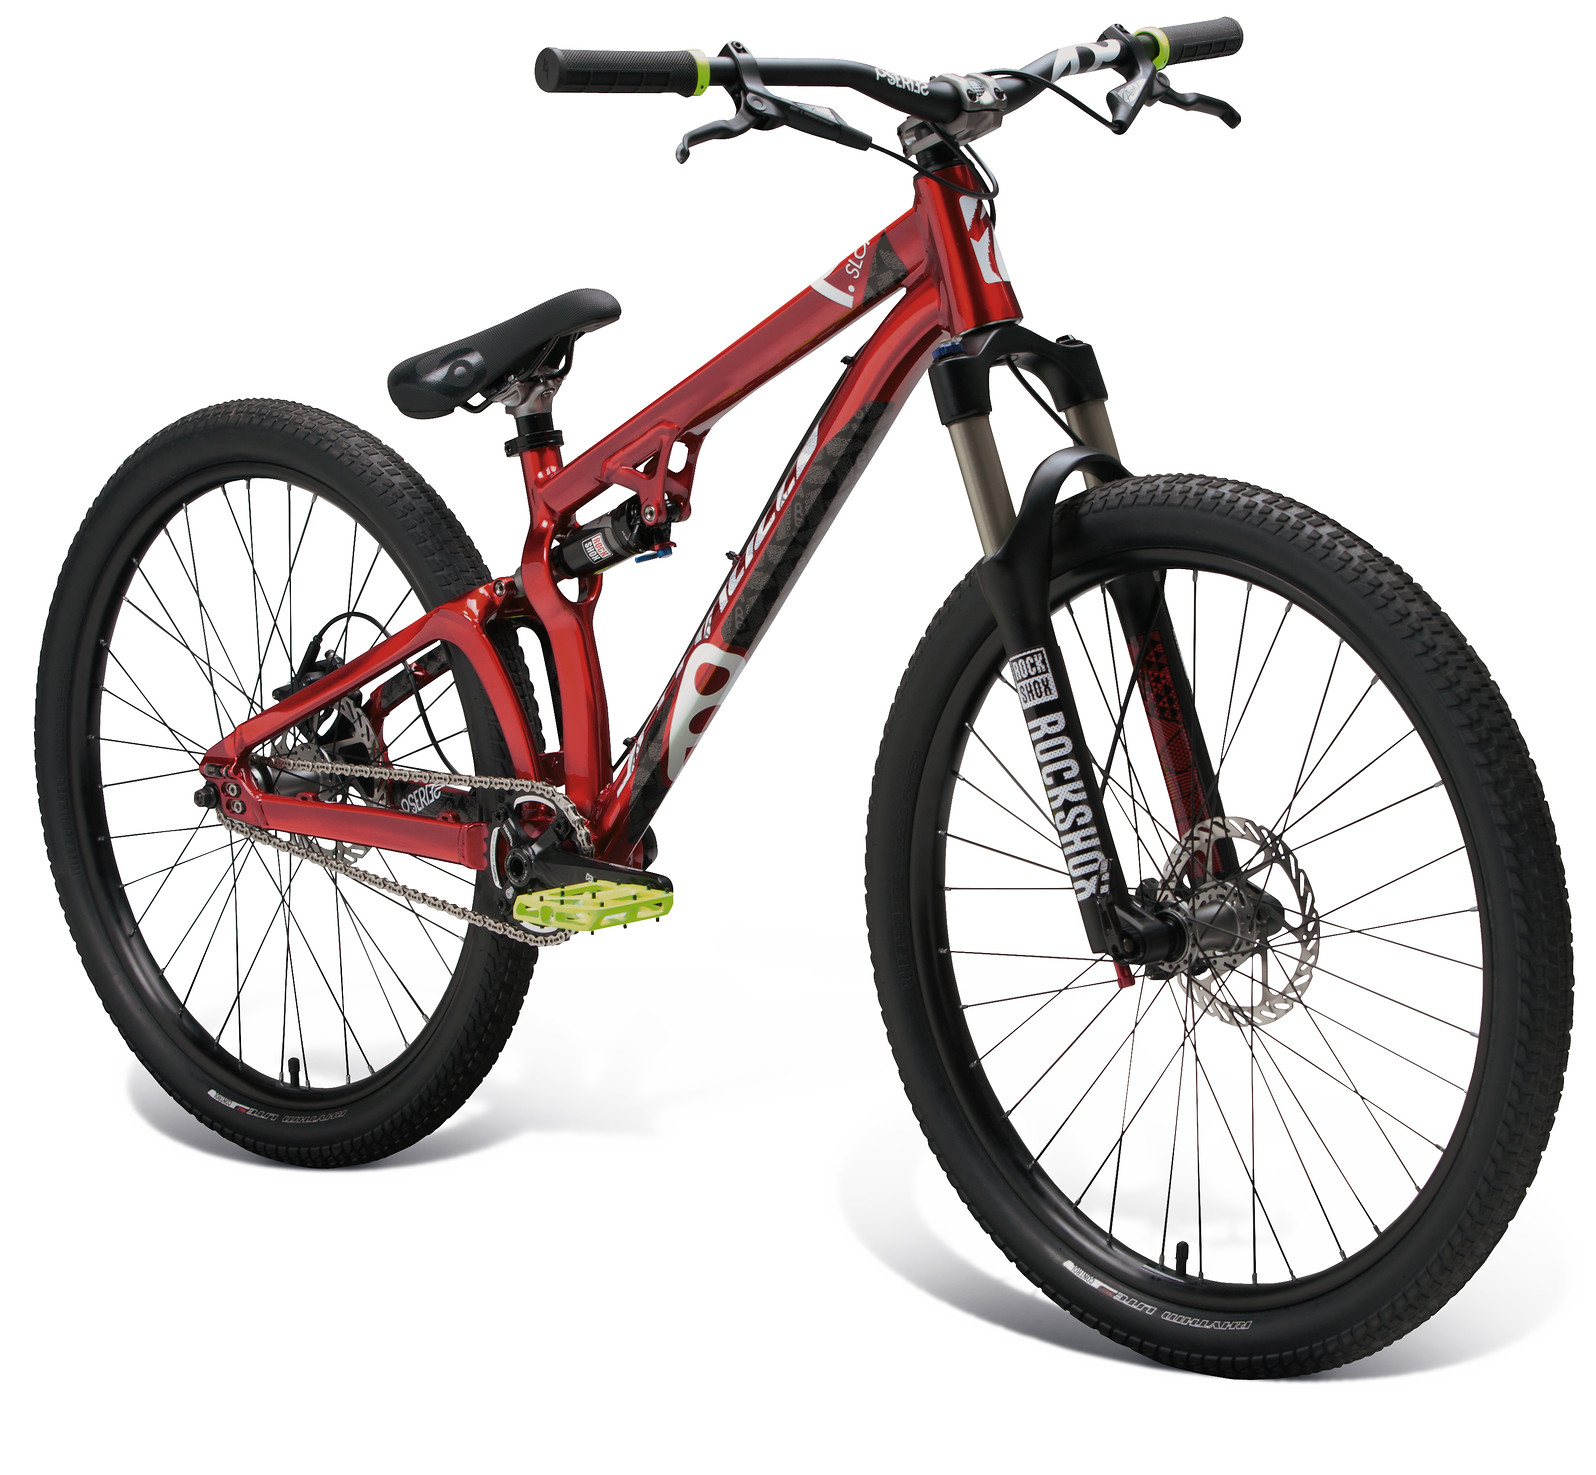 2013 Specialized P.Slope Bike 91E9-8122-p-slope-bru_tc_red_TB_flat